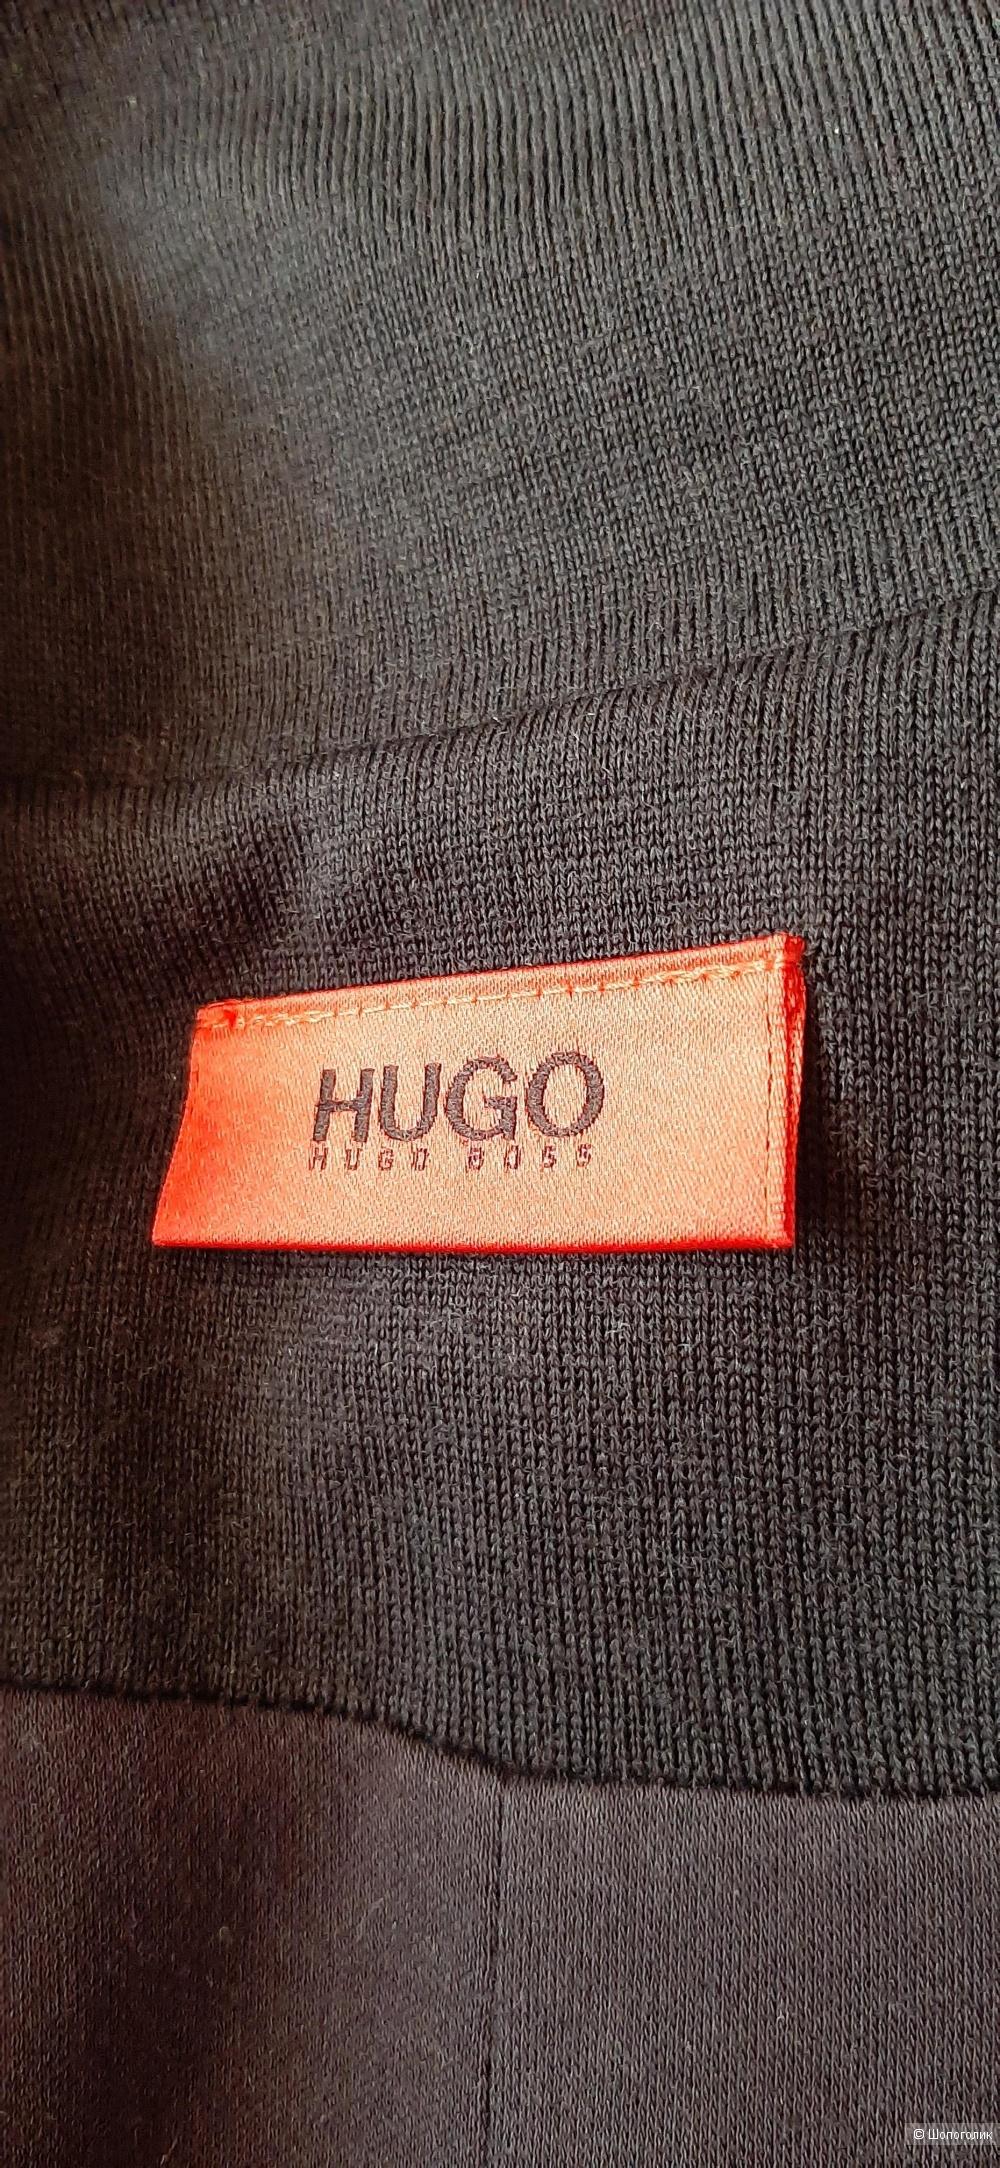 Трикотажный жакет Hugo Boss, S-М